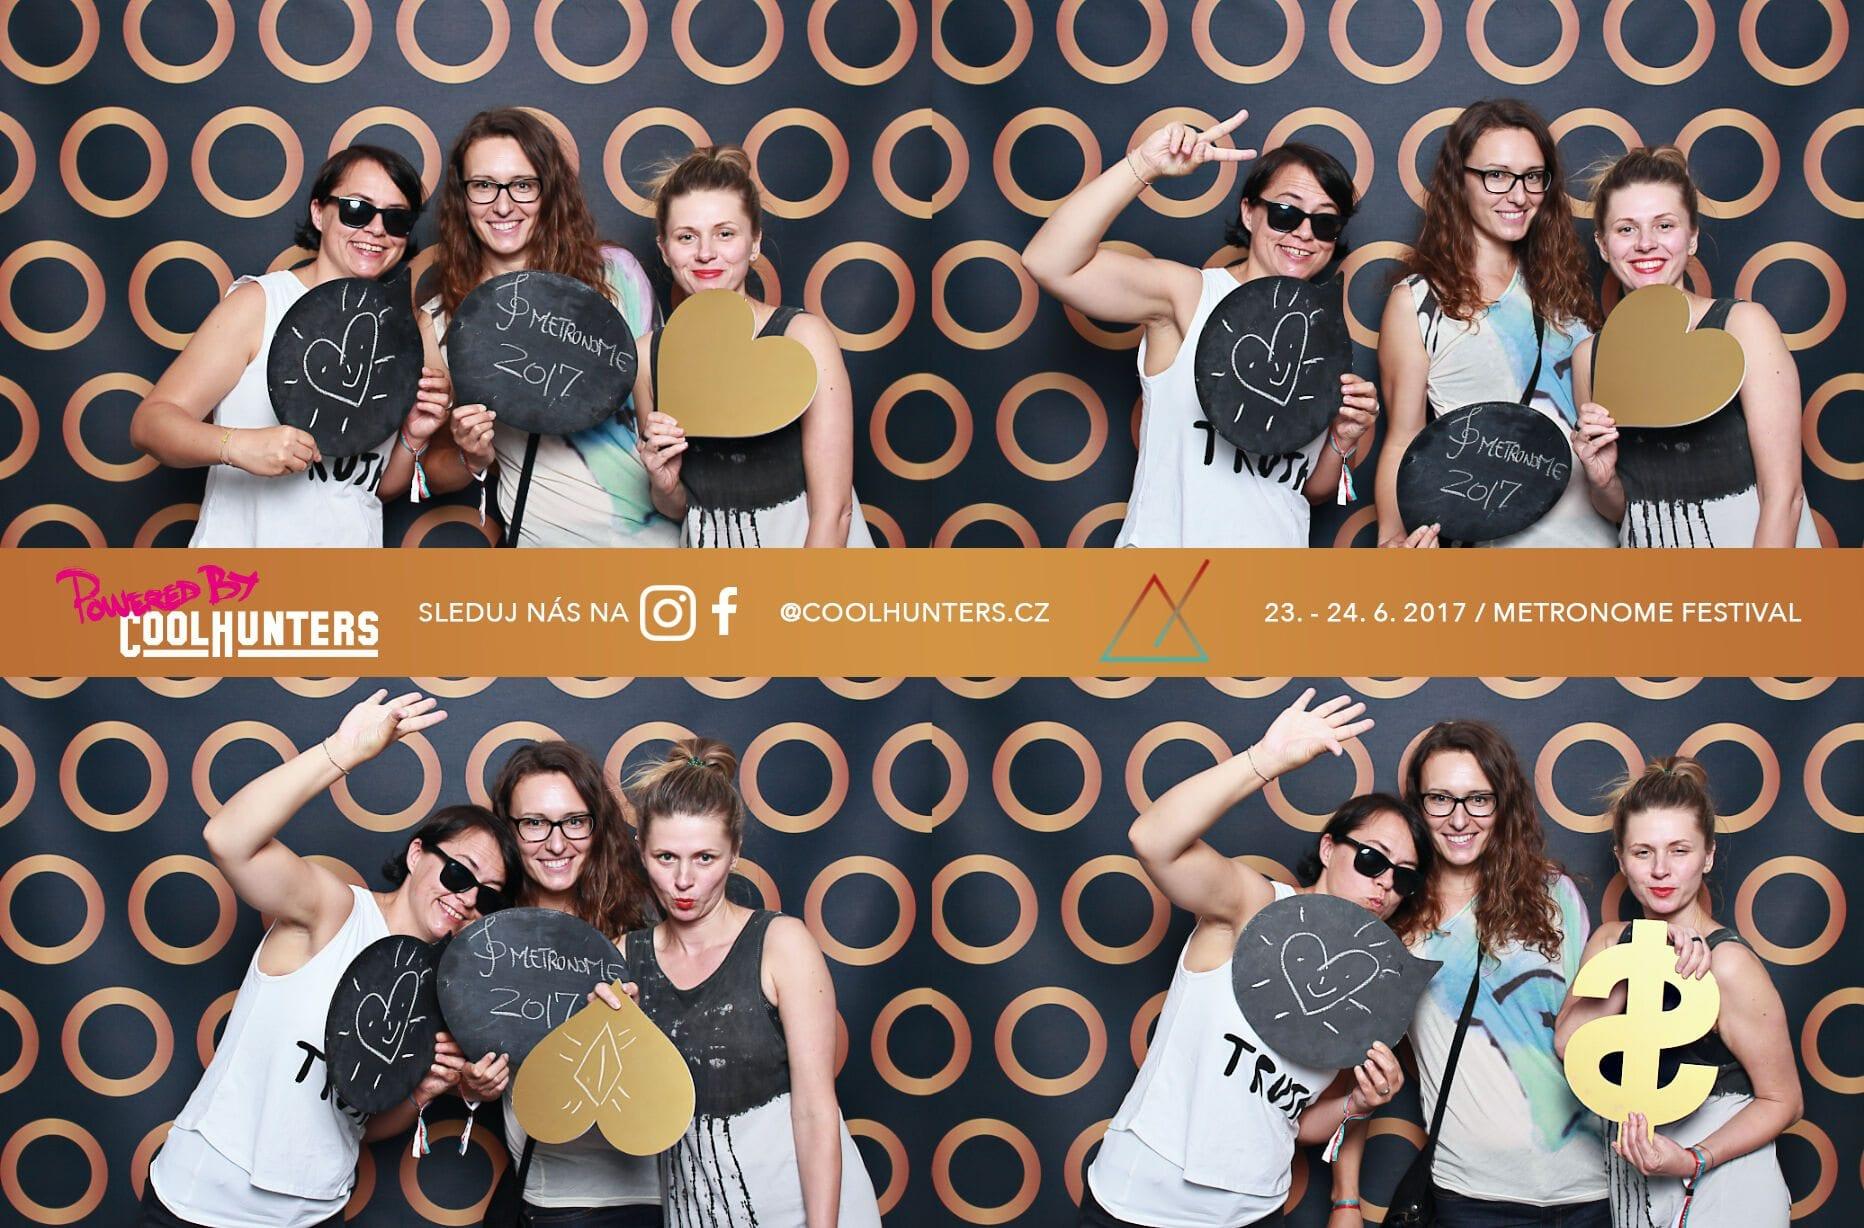 fotokoutek-coolhunters-metronome-festival-23-6-2017-273466